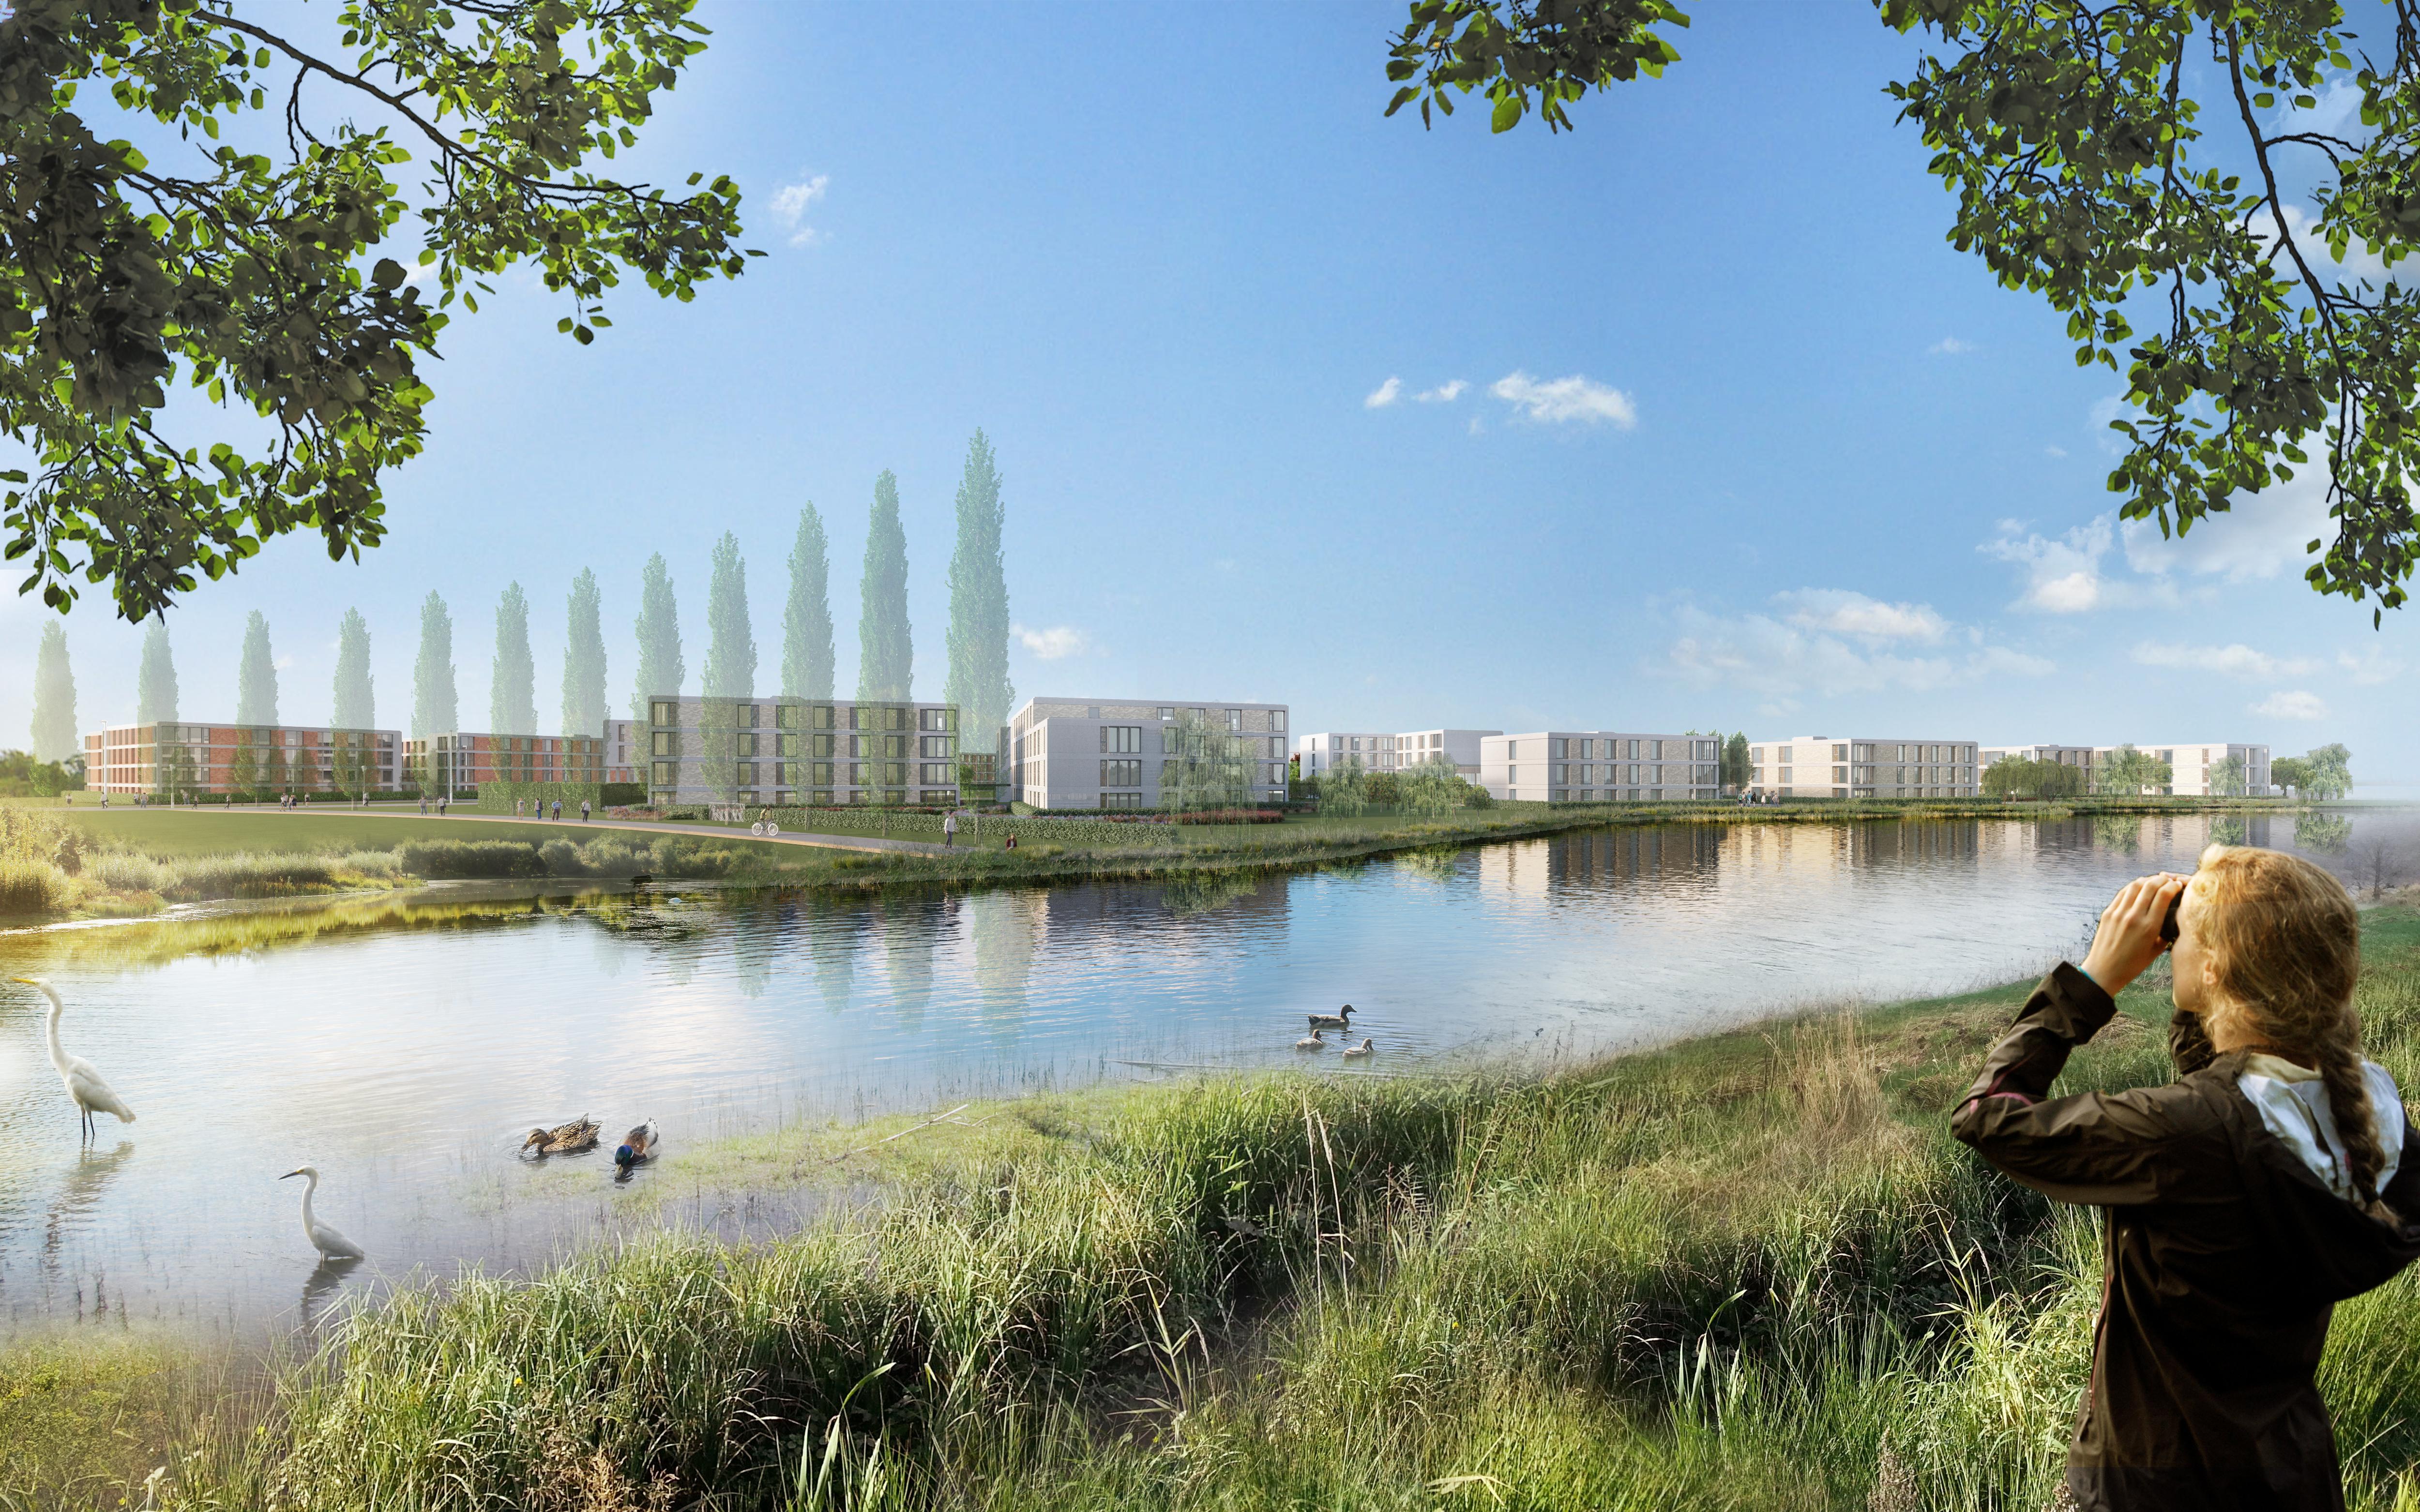 Financial close on £130m University of York accommodation project image